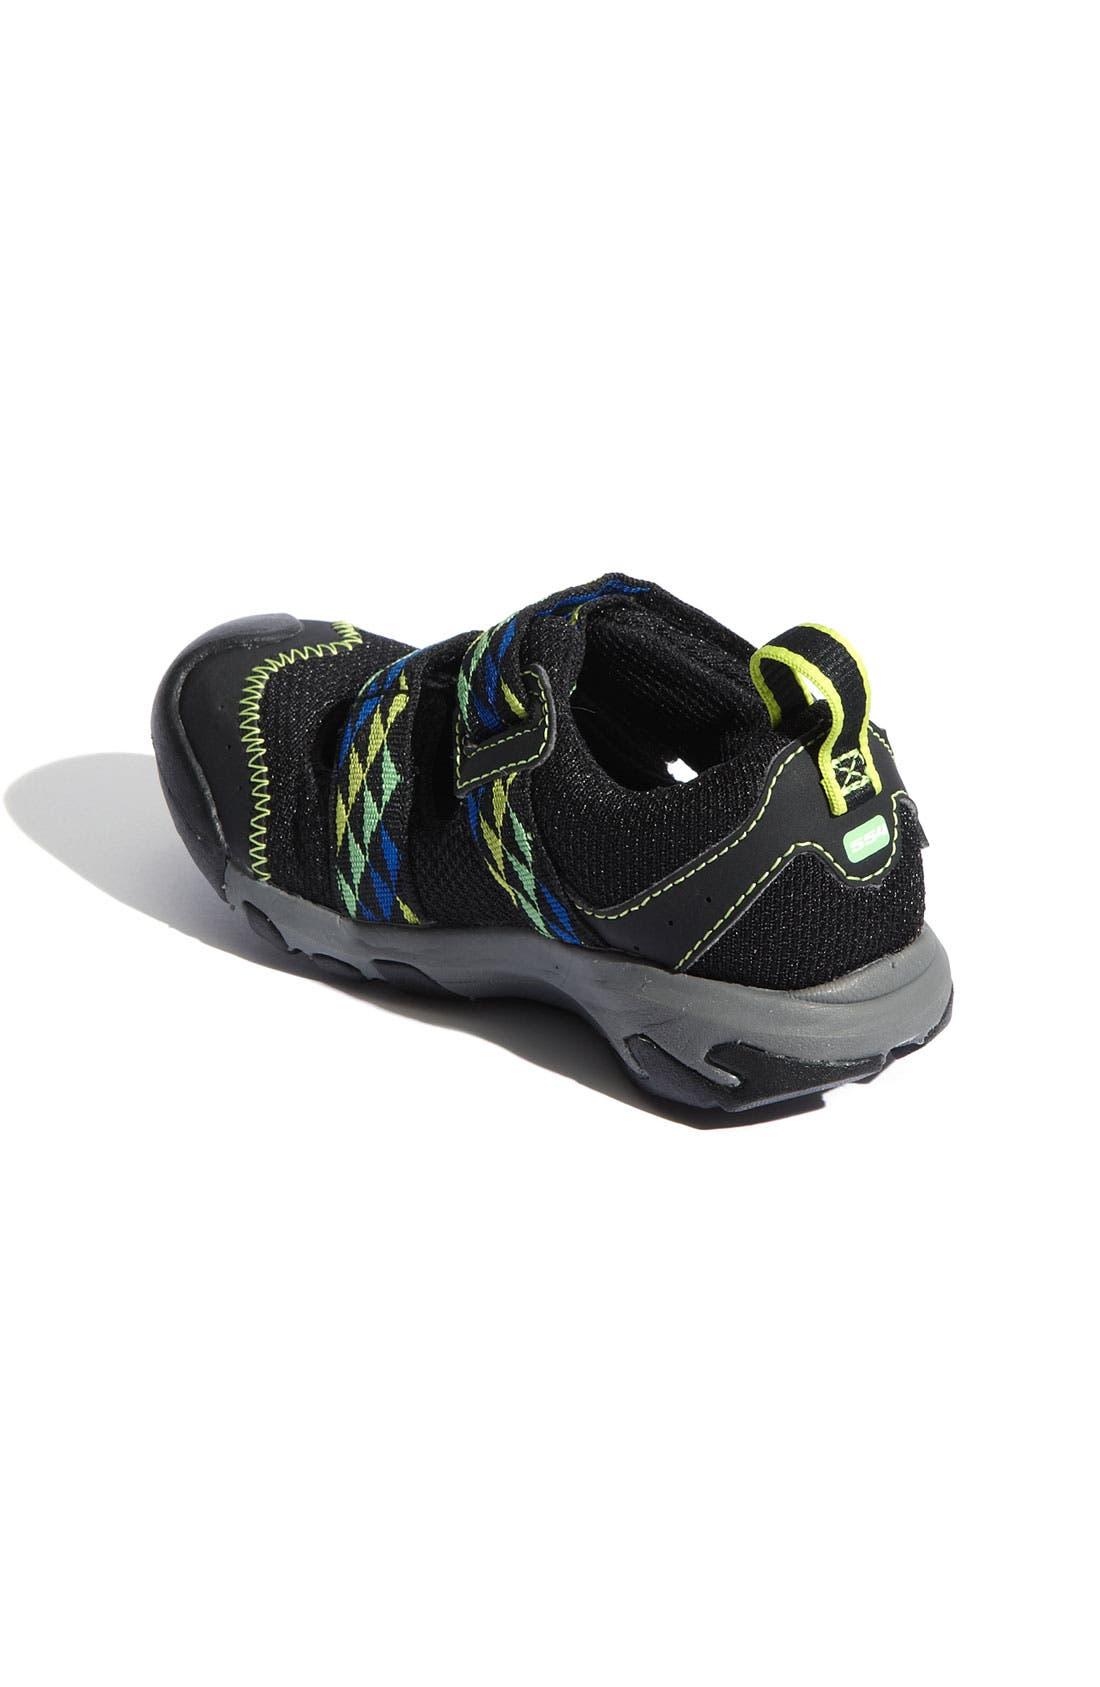 '554' Water Shoe,                             Alternate thumbnail 3, color,                             001